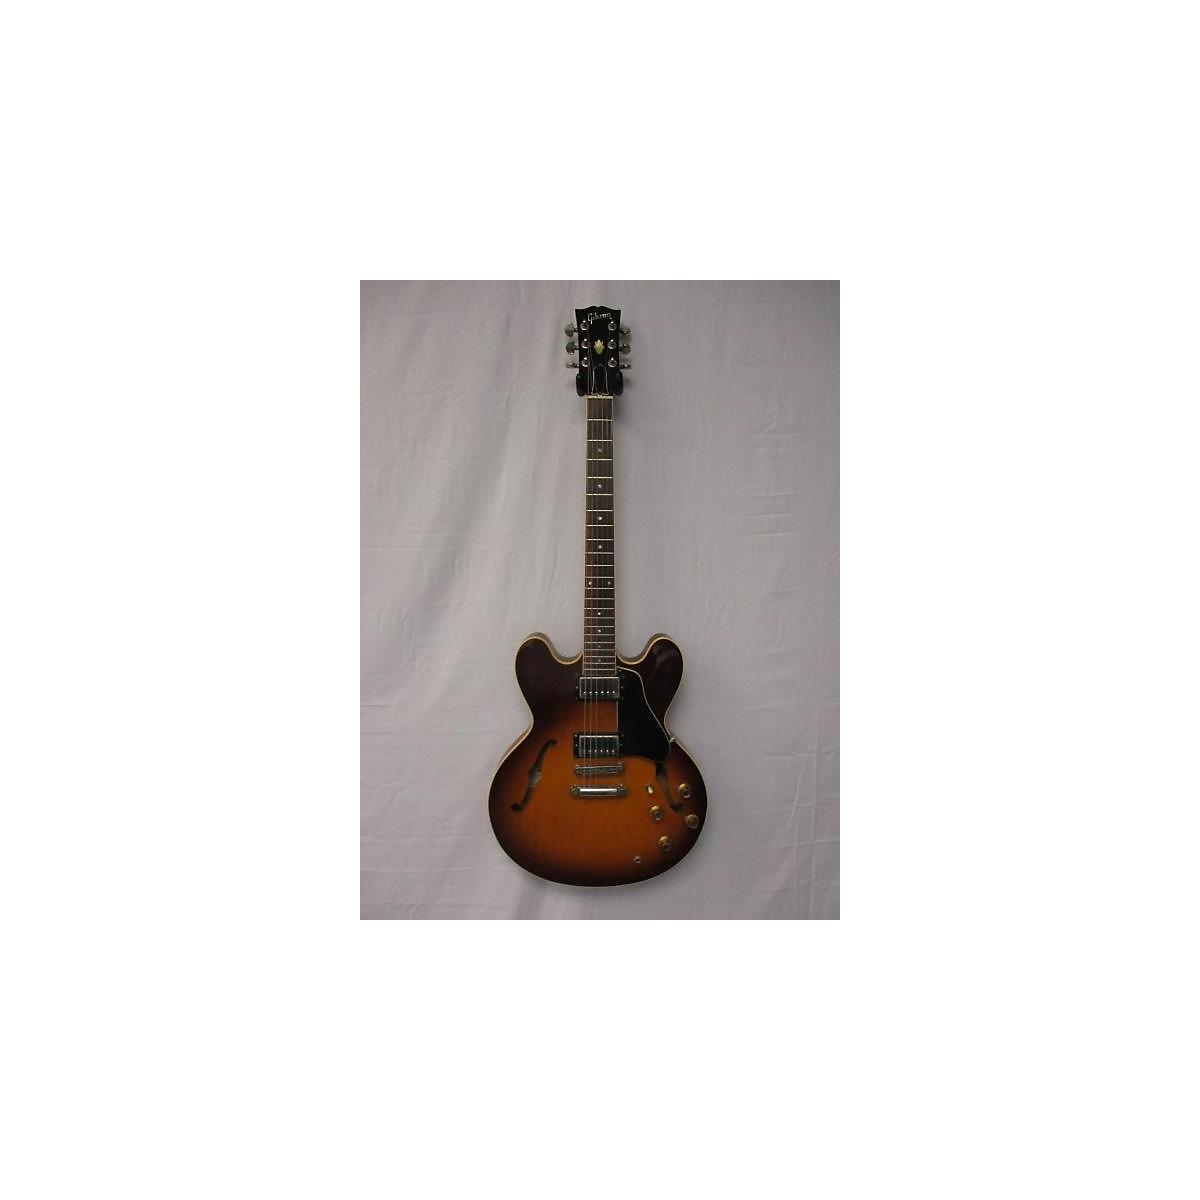 Gibson 1987 ES335 Hollow Body Electric Guitar